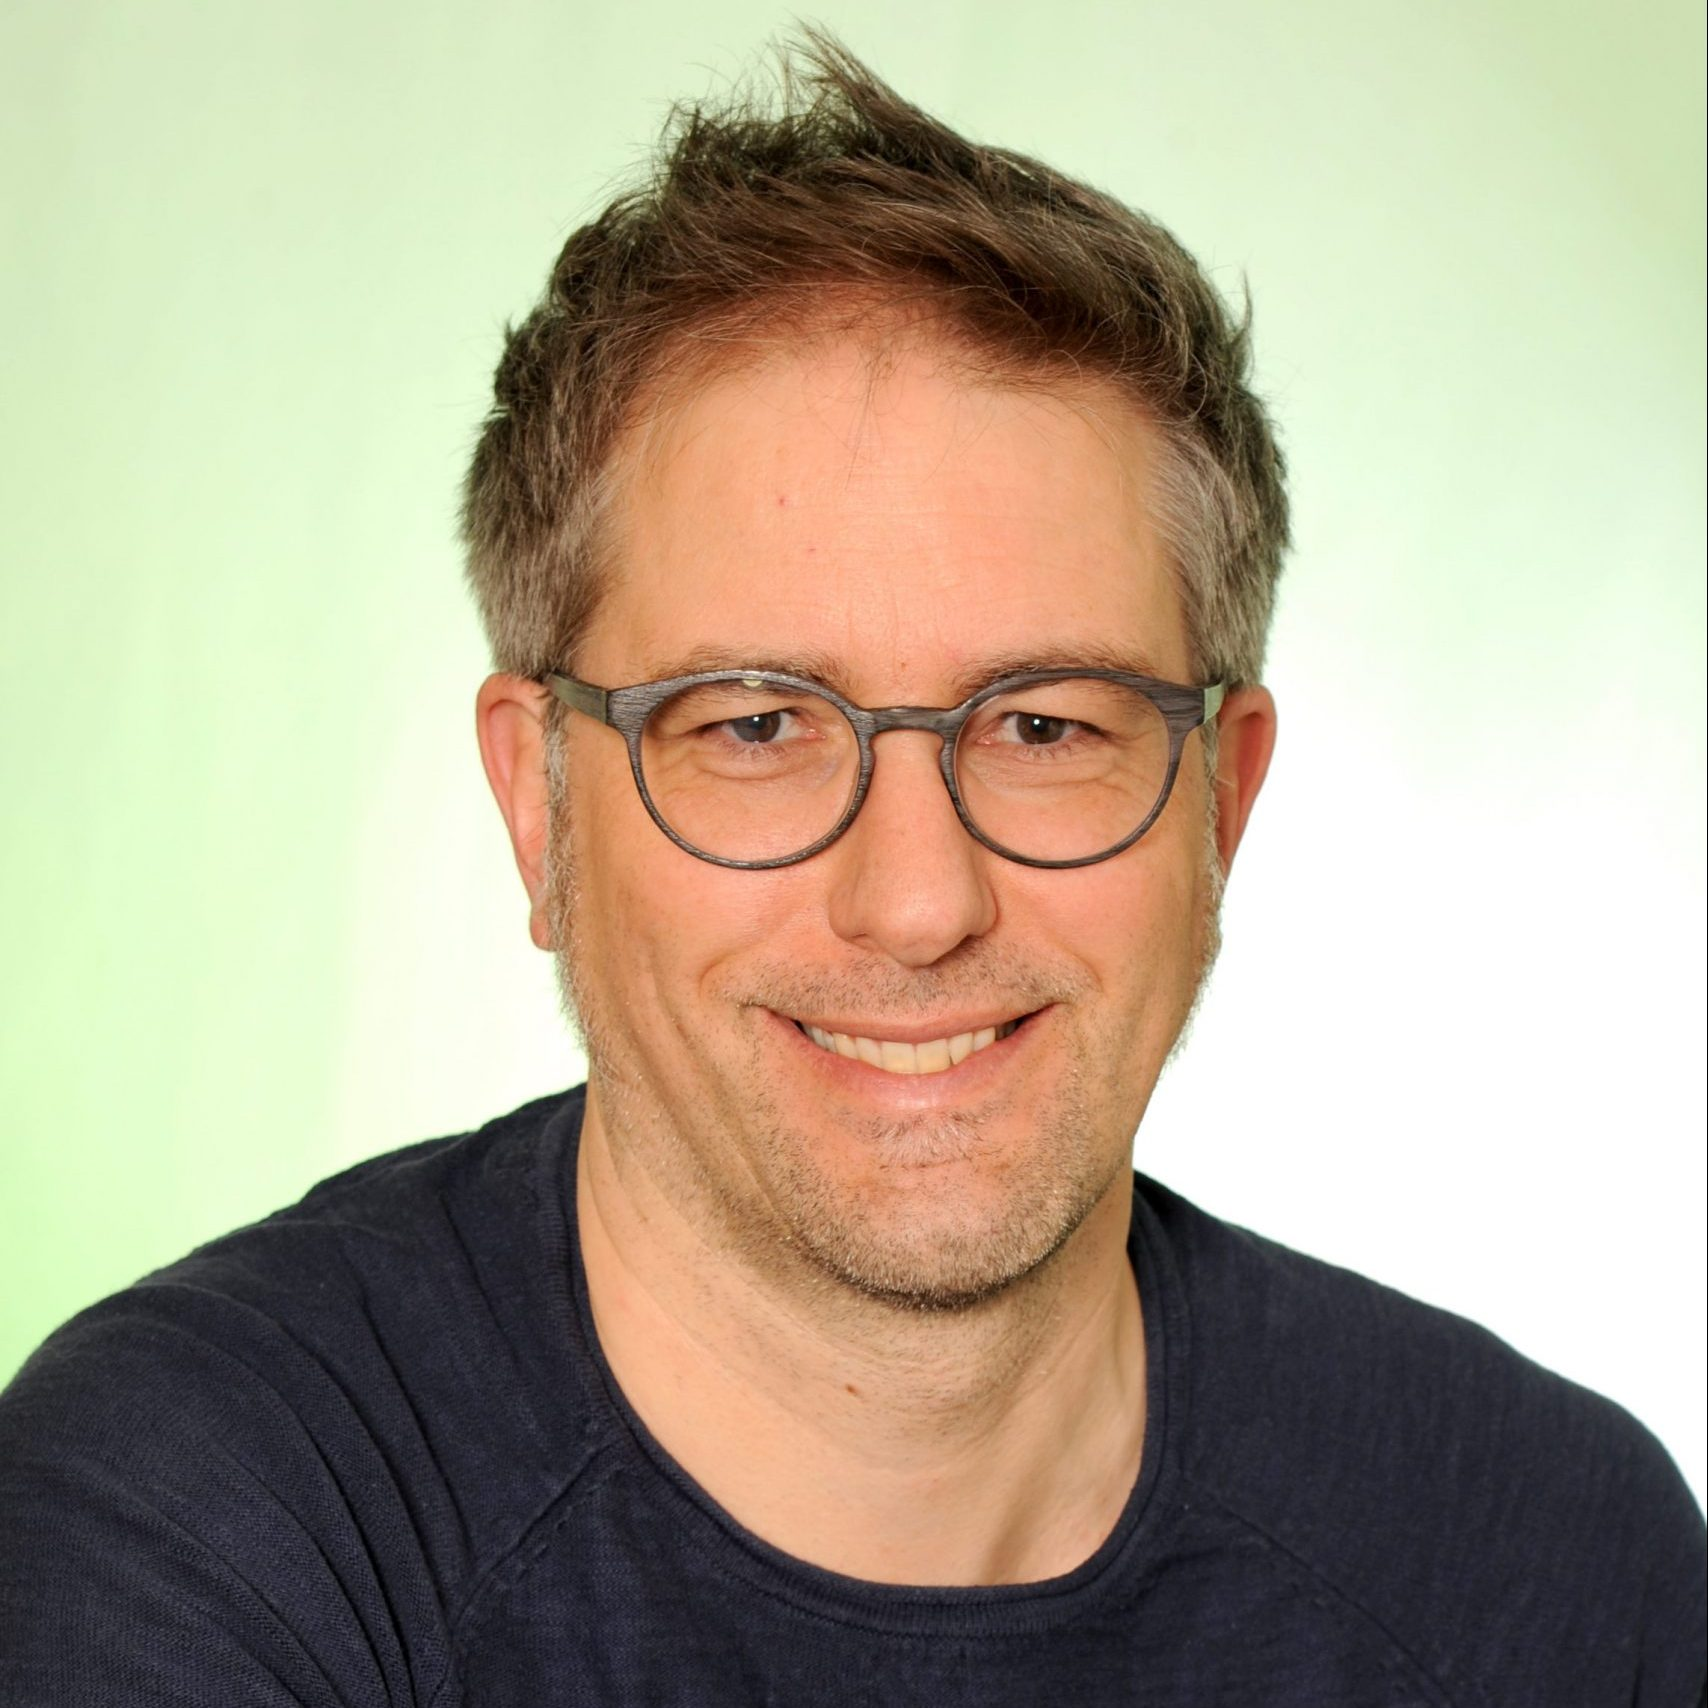 Holger Beha